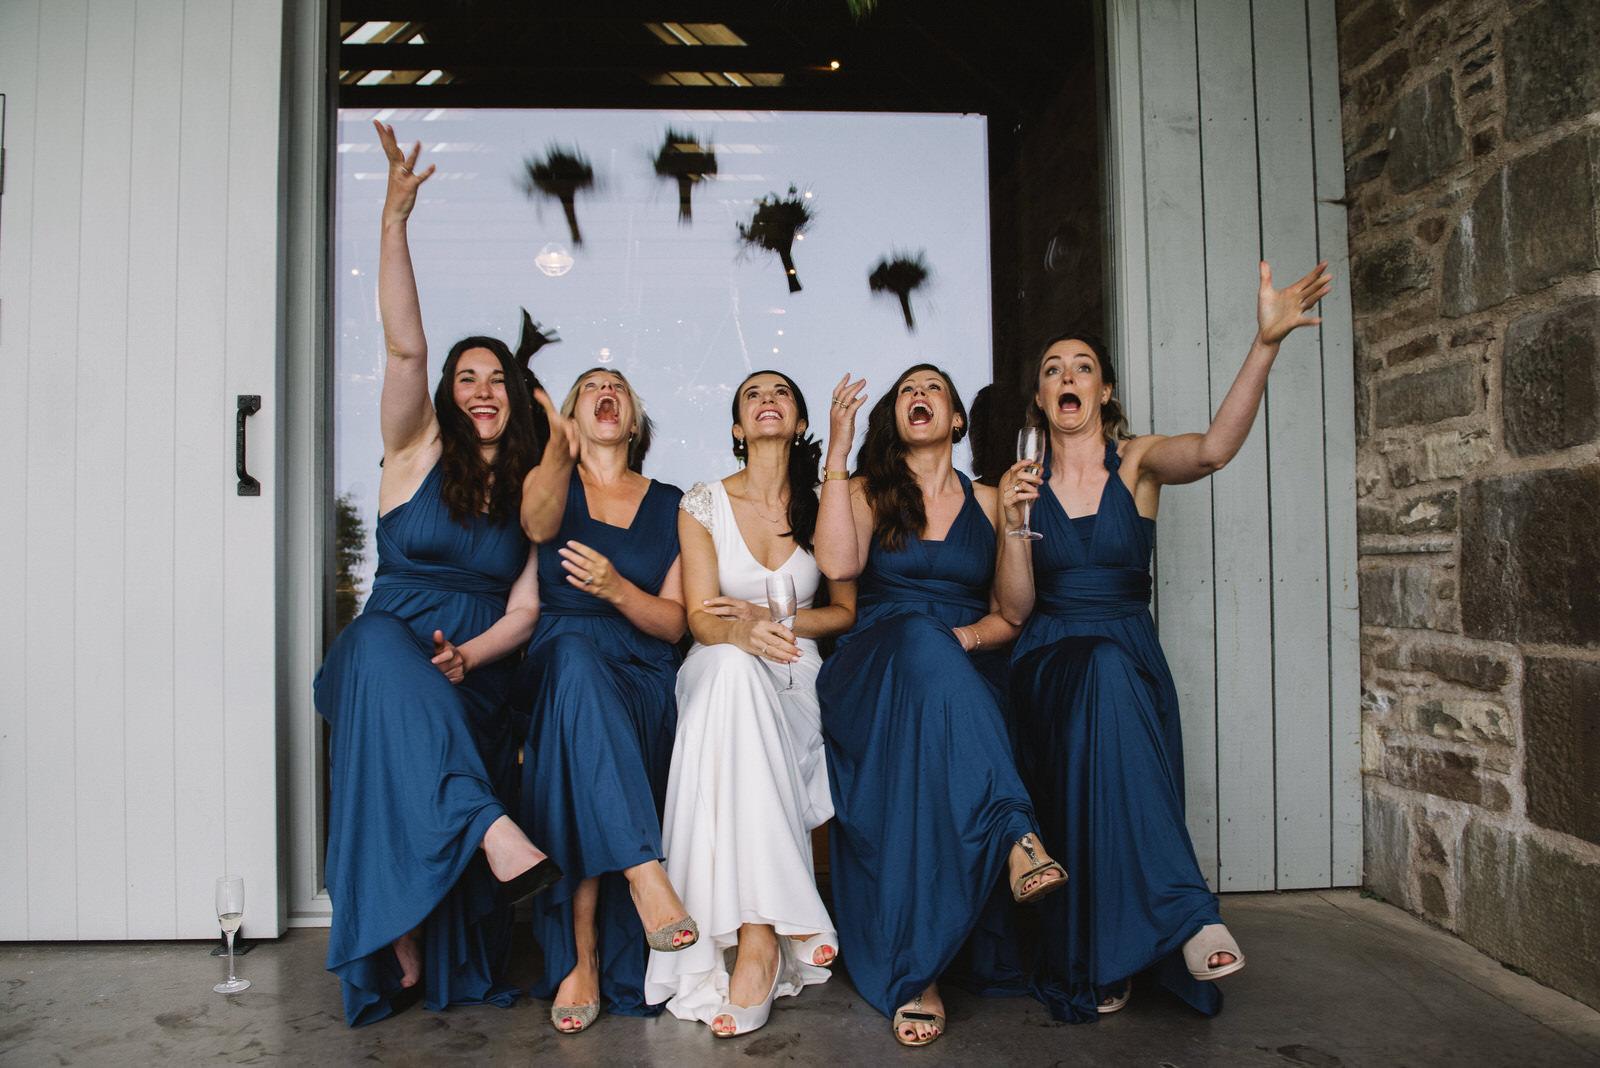 036-GUARDSWELL-FARM-WEDDING-ALTERNATIVE-SCOTTISH-WEDDING-PHOTOGRAPHER-SCOTTISH-WEDDING-DESTINATION-WEDDING-PHOTOGRAPHER.JPG